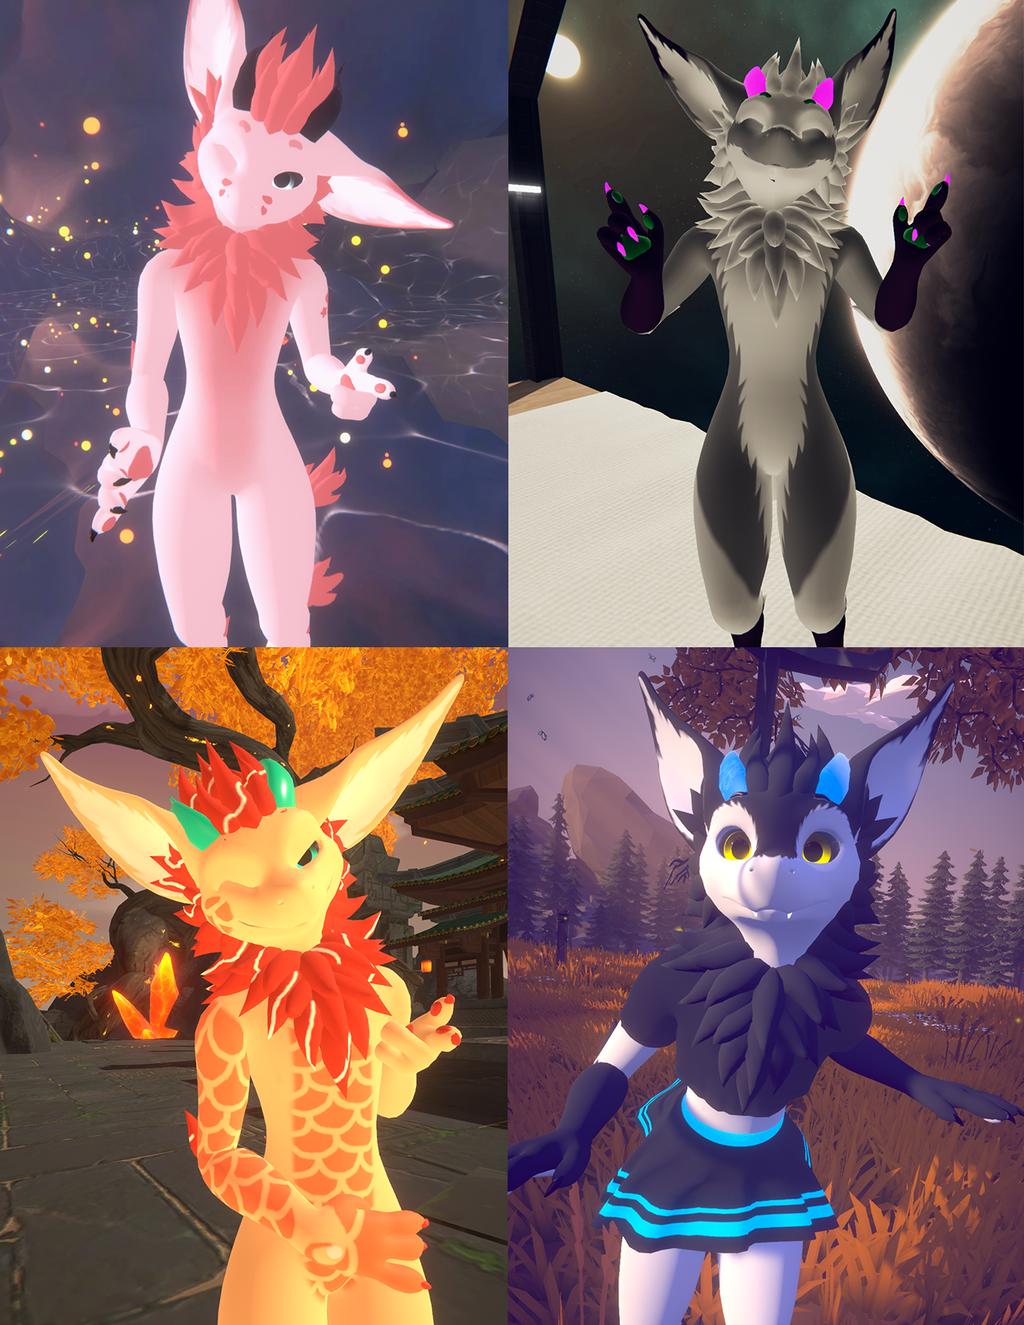 Most recent image: Nardoragon Re-skins #1